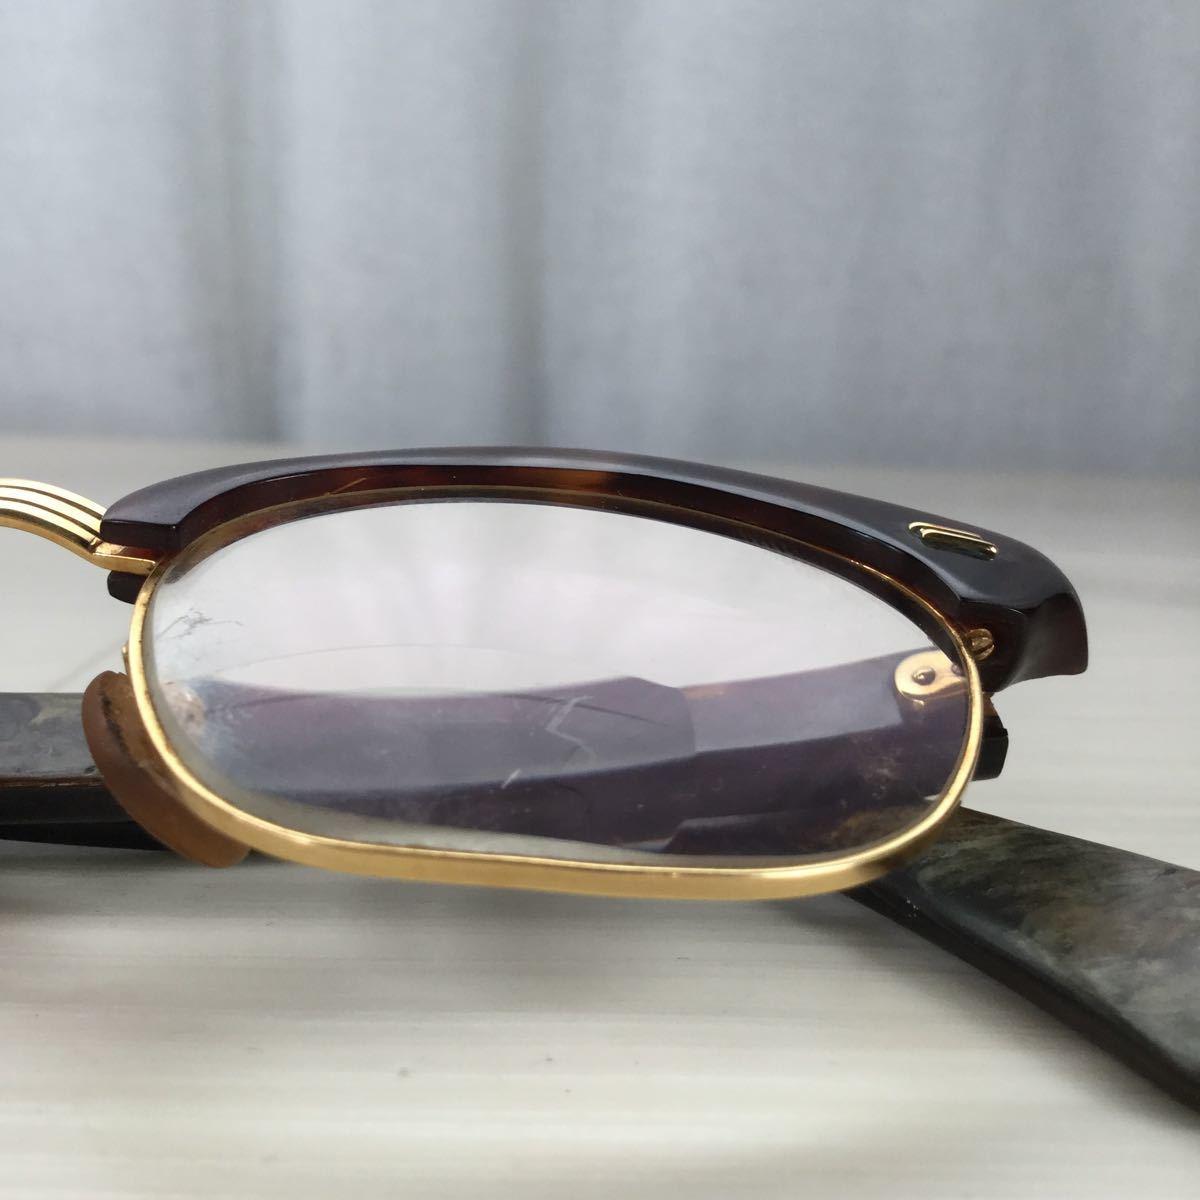 60s 鼈甲 べっ甲 べっこう メガネ 眼鏡 めがね 眼鏡フレーム 金 k18 18金 ゴールド 茶 総重量 約44g_画像9